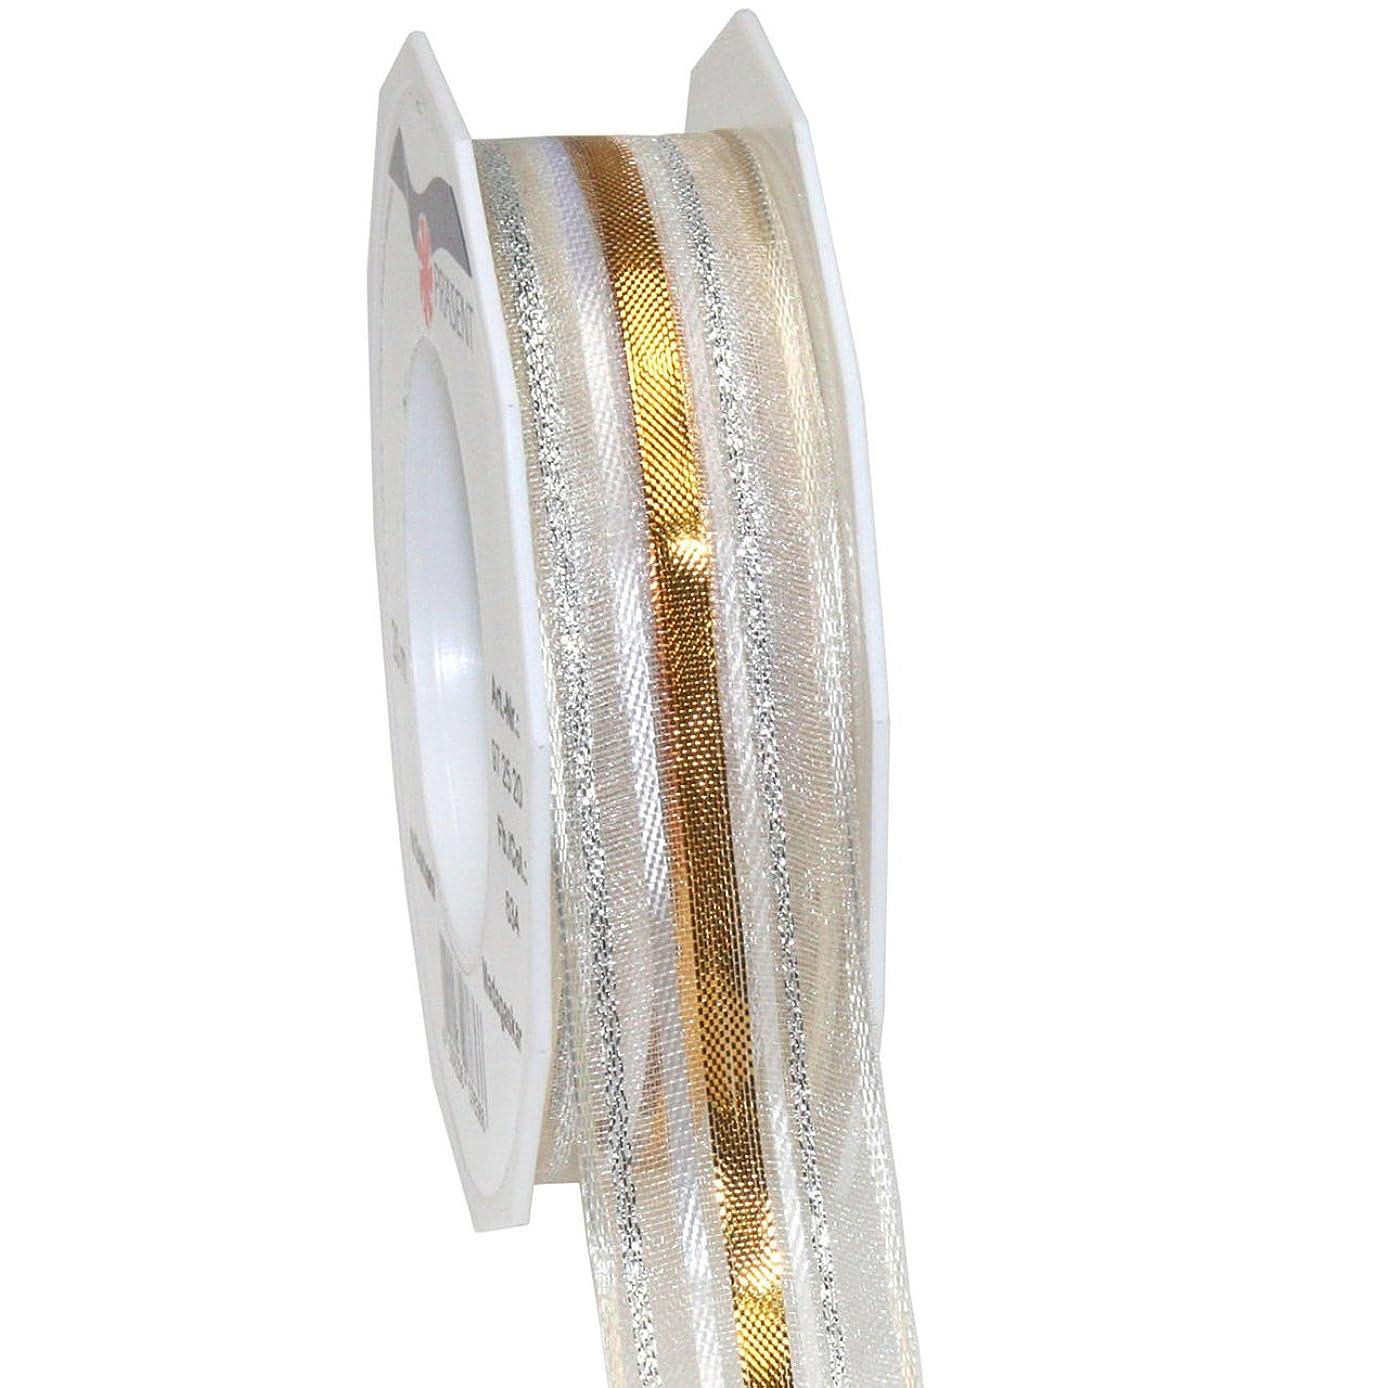 Morex Ribbon Madagascar Metallic Sheer Wired Ribbon, 1 by 22-Inch Yard Spool, Gold